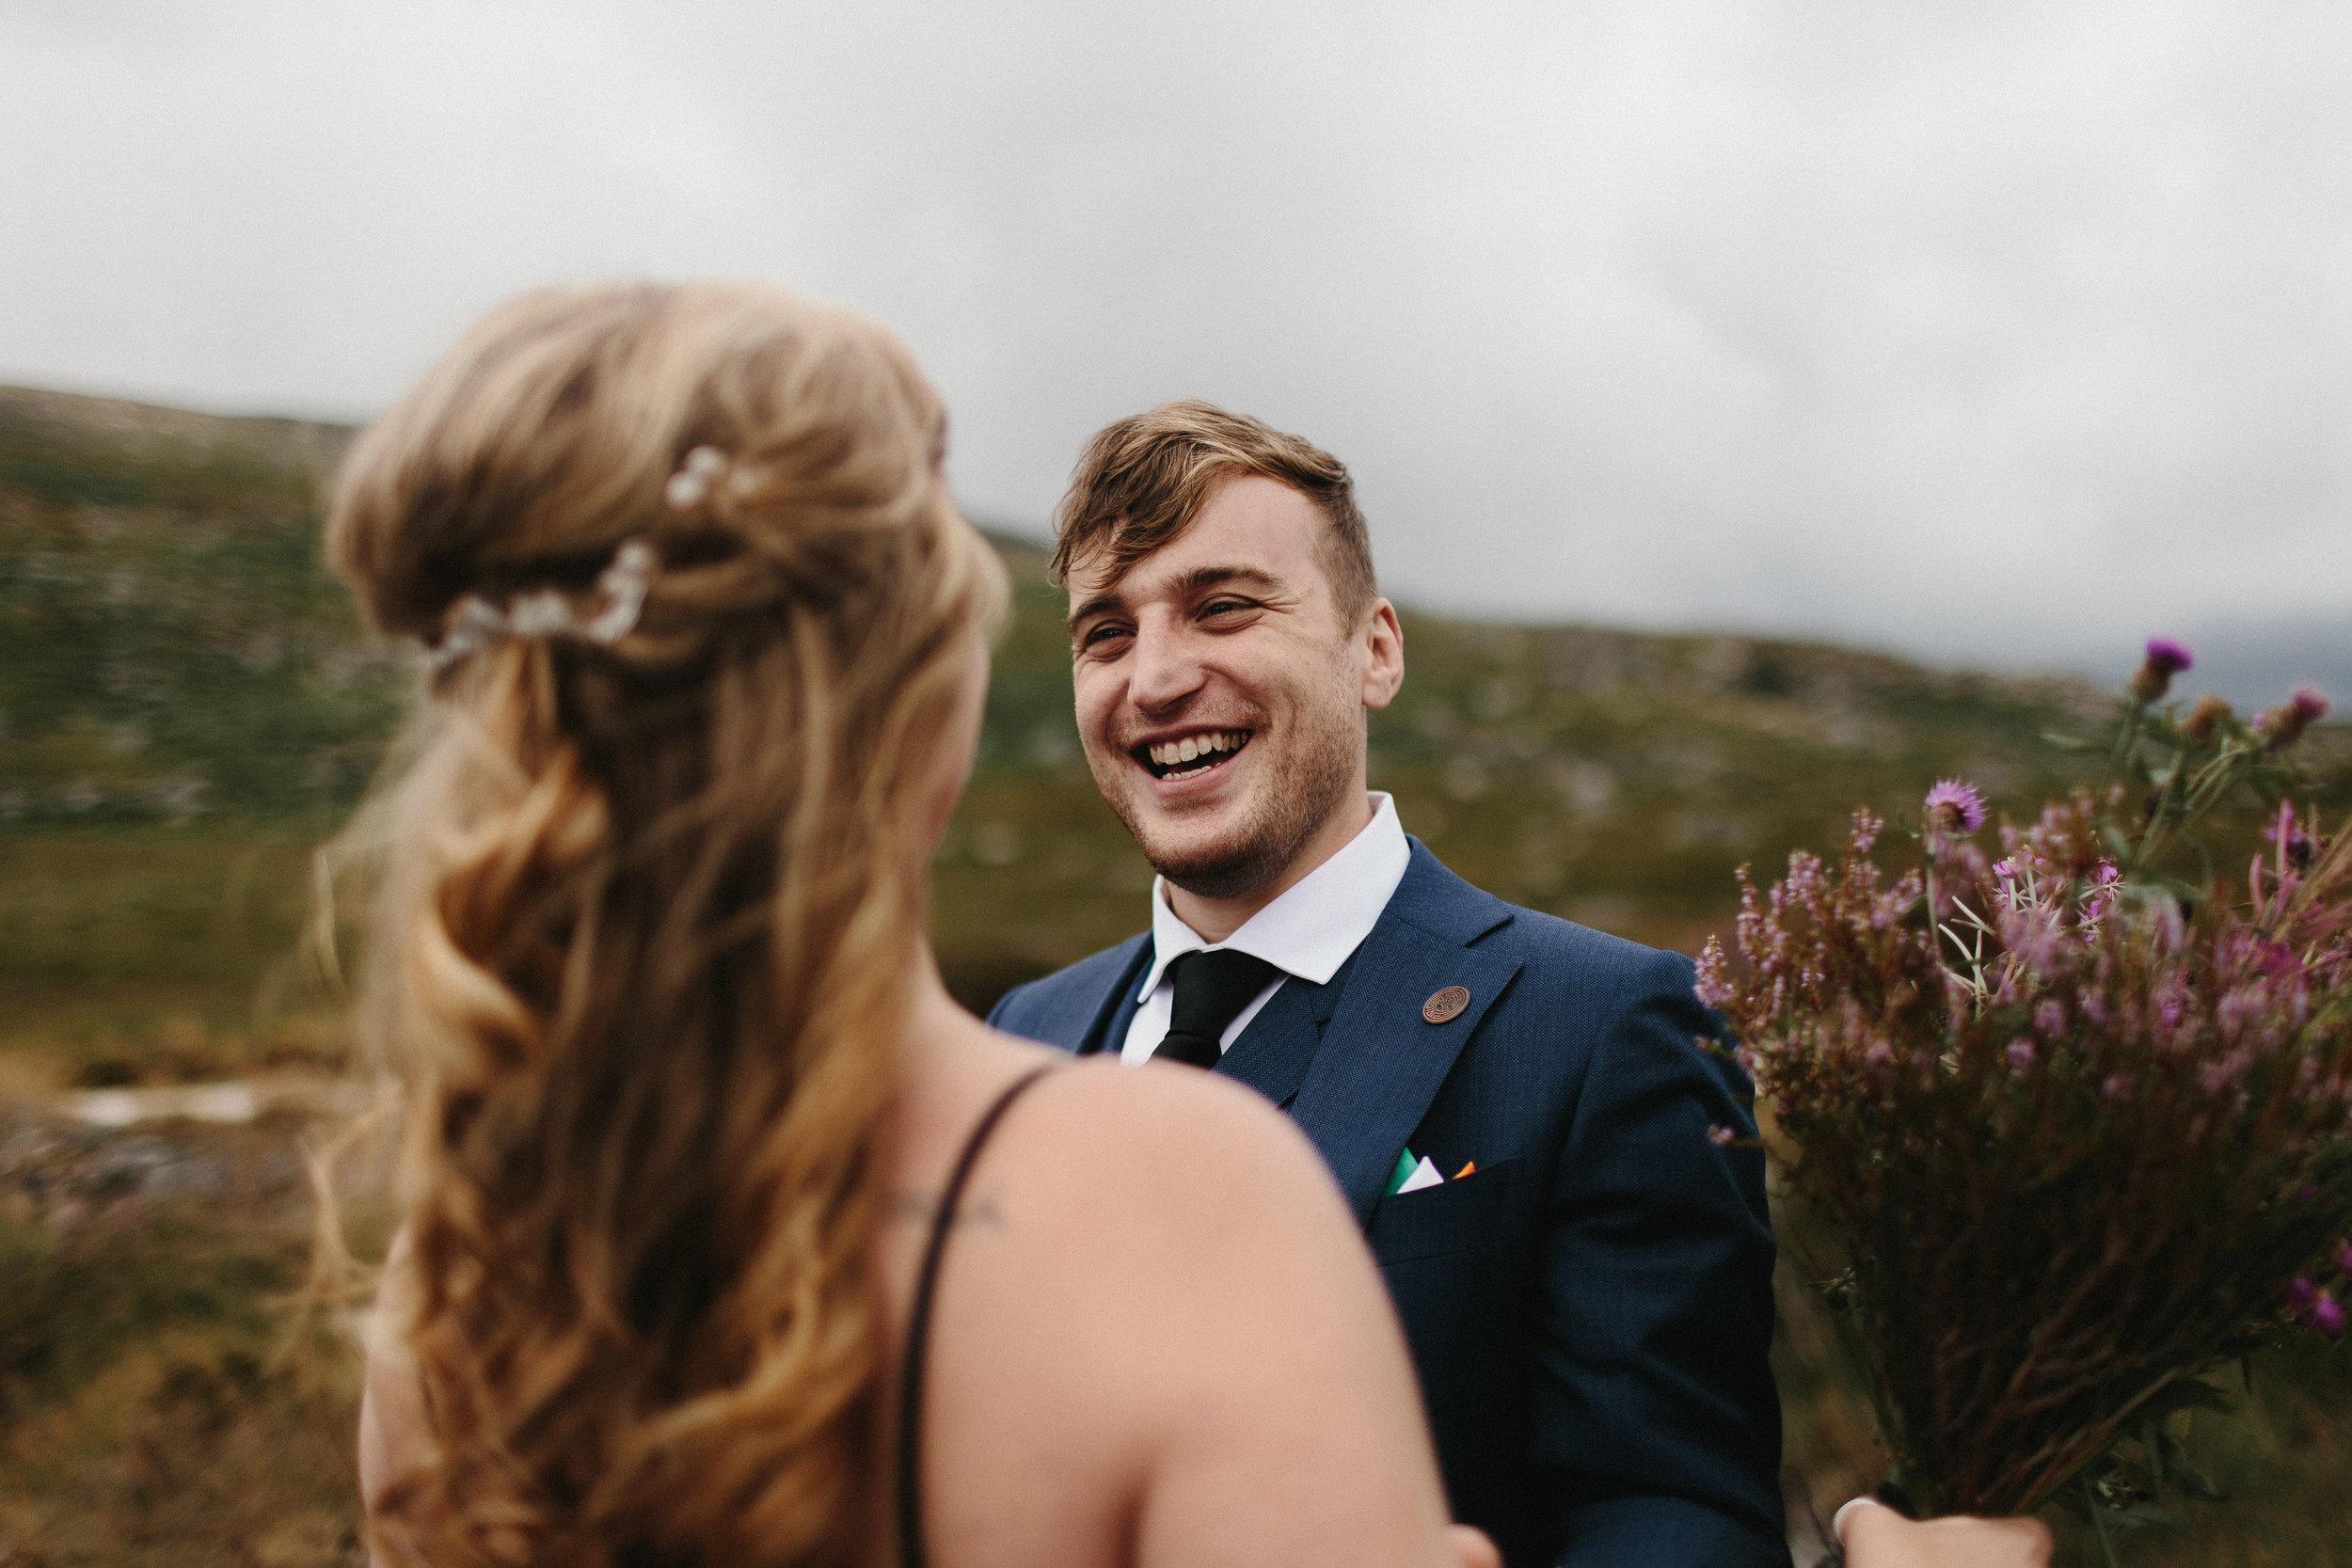 ireland_elopement_black_wedding_dress_wicklow_glendalough_athy_st_kevins_way_1372.jpg